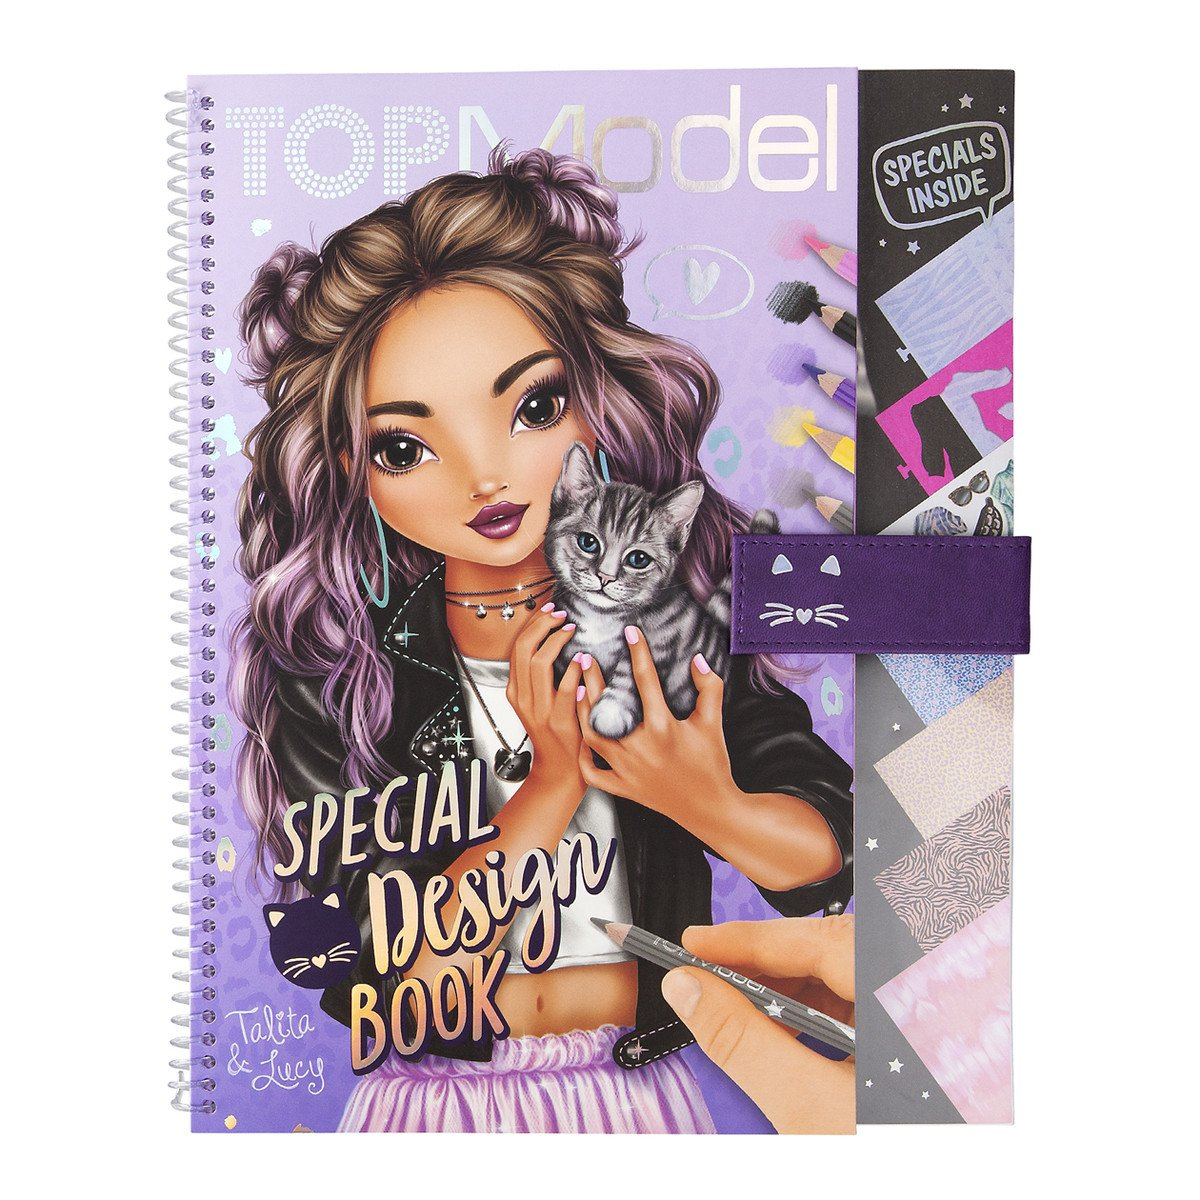 Top Model - Special Design Book (0411253)